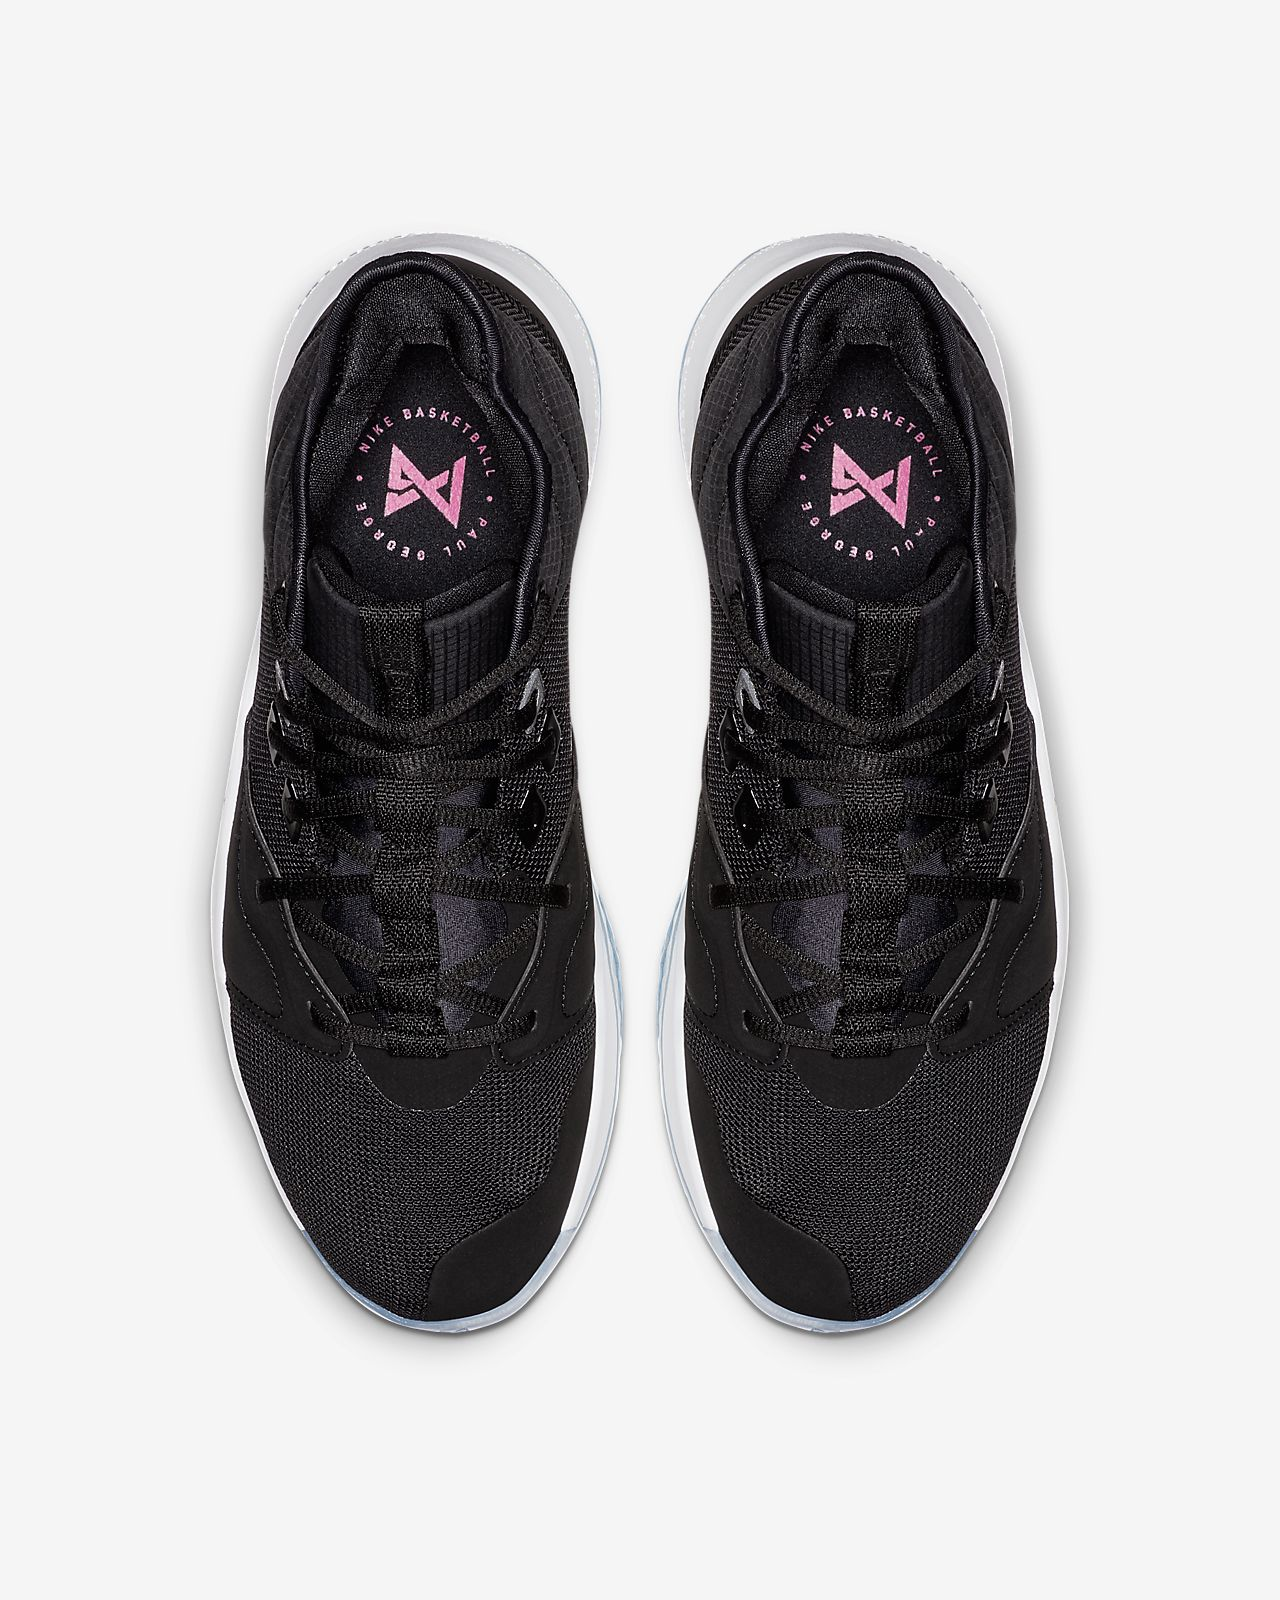 new arrival 75da1 0f9ba Low Resolution PG 3 Basketball Shoe PG 3 Basketball Shoe